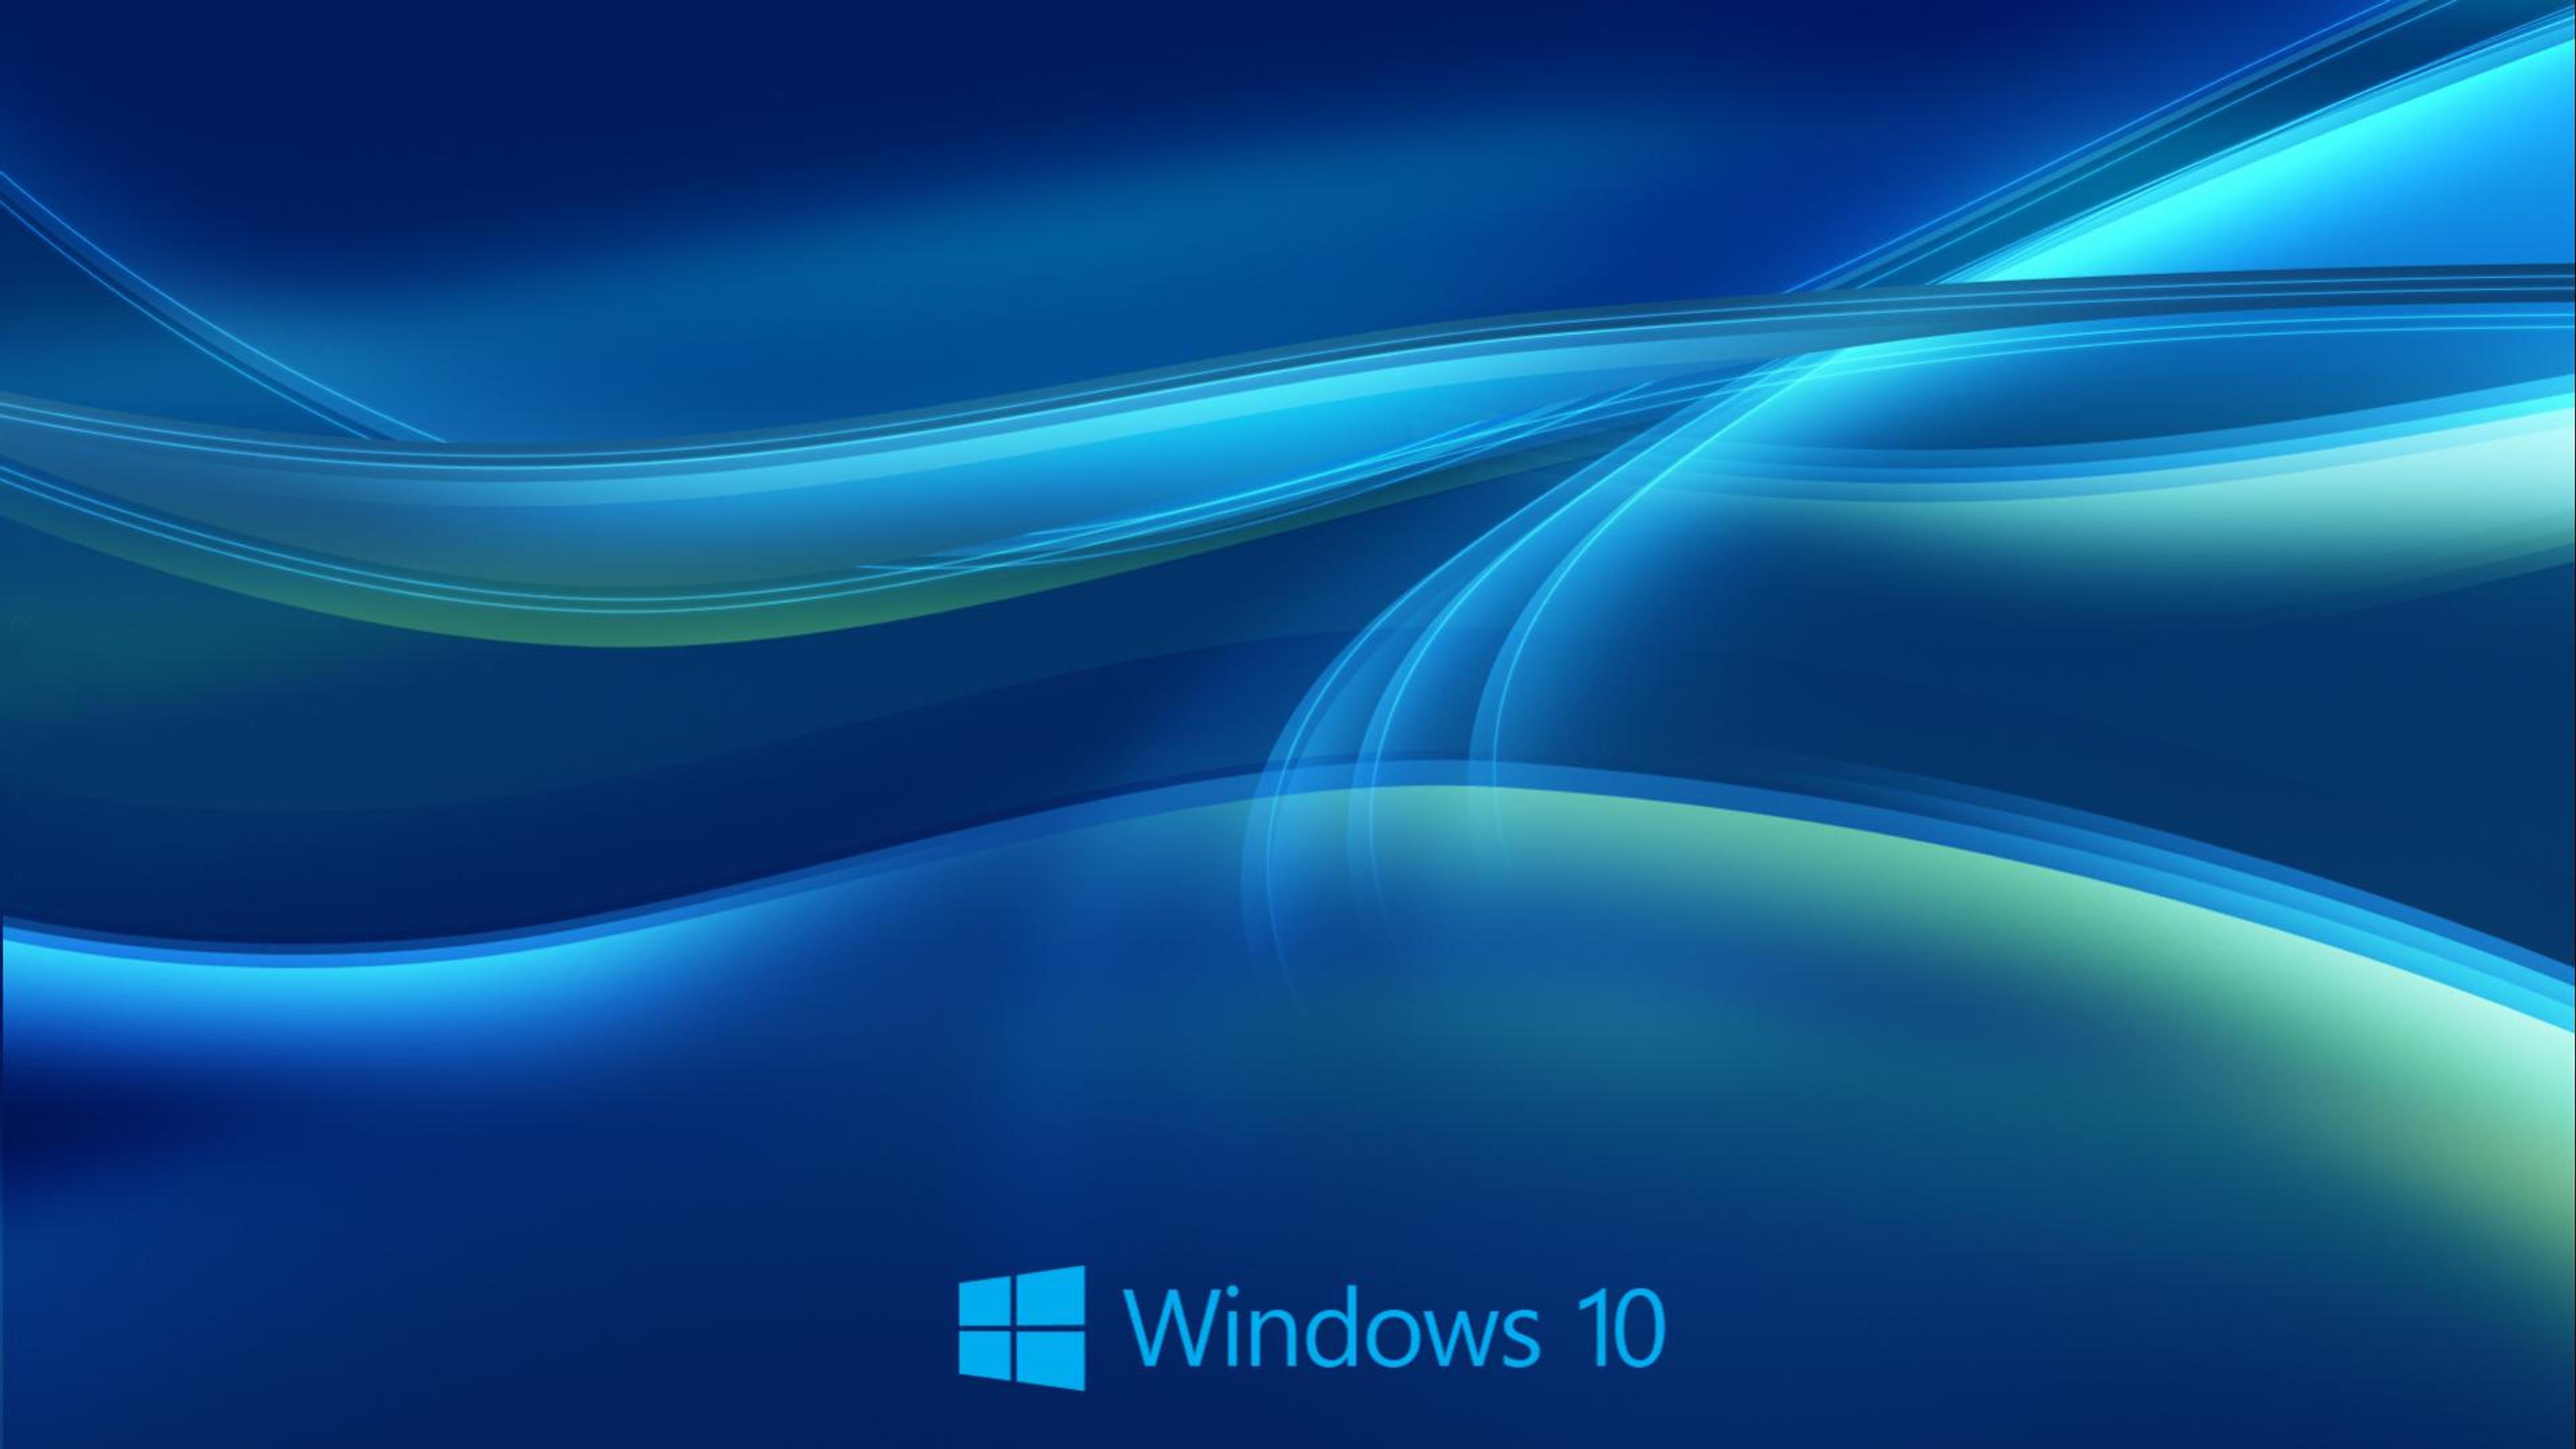 Download wallpaper 3840x2160 hd blue lines beautiful windows 10